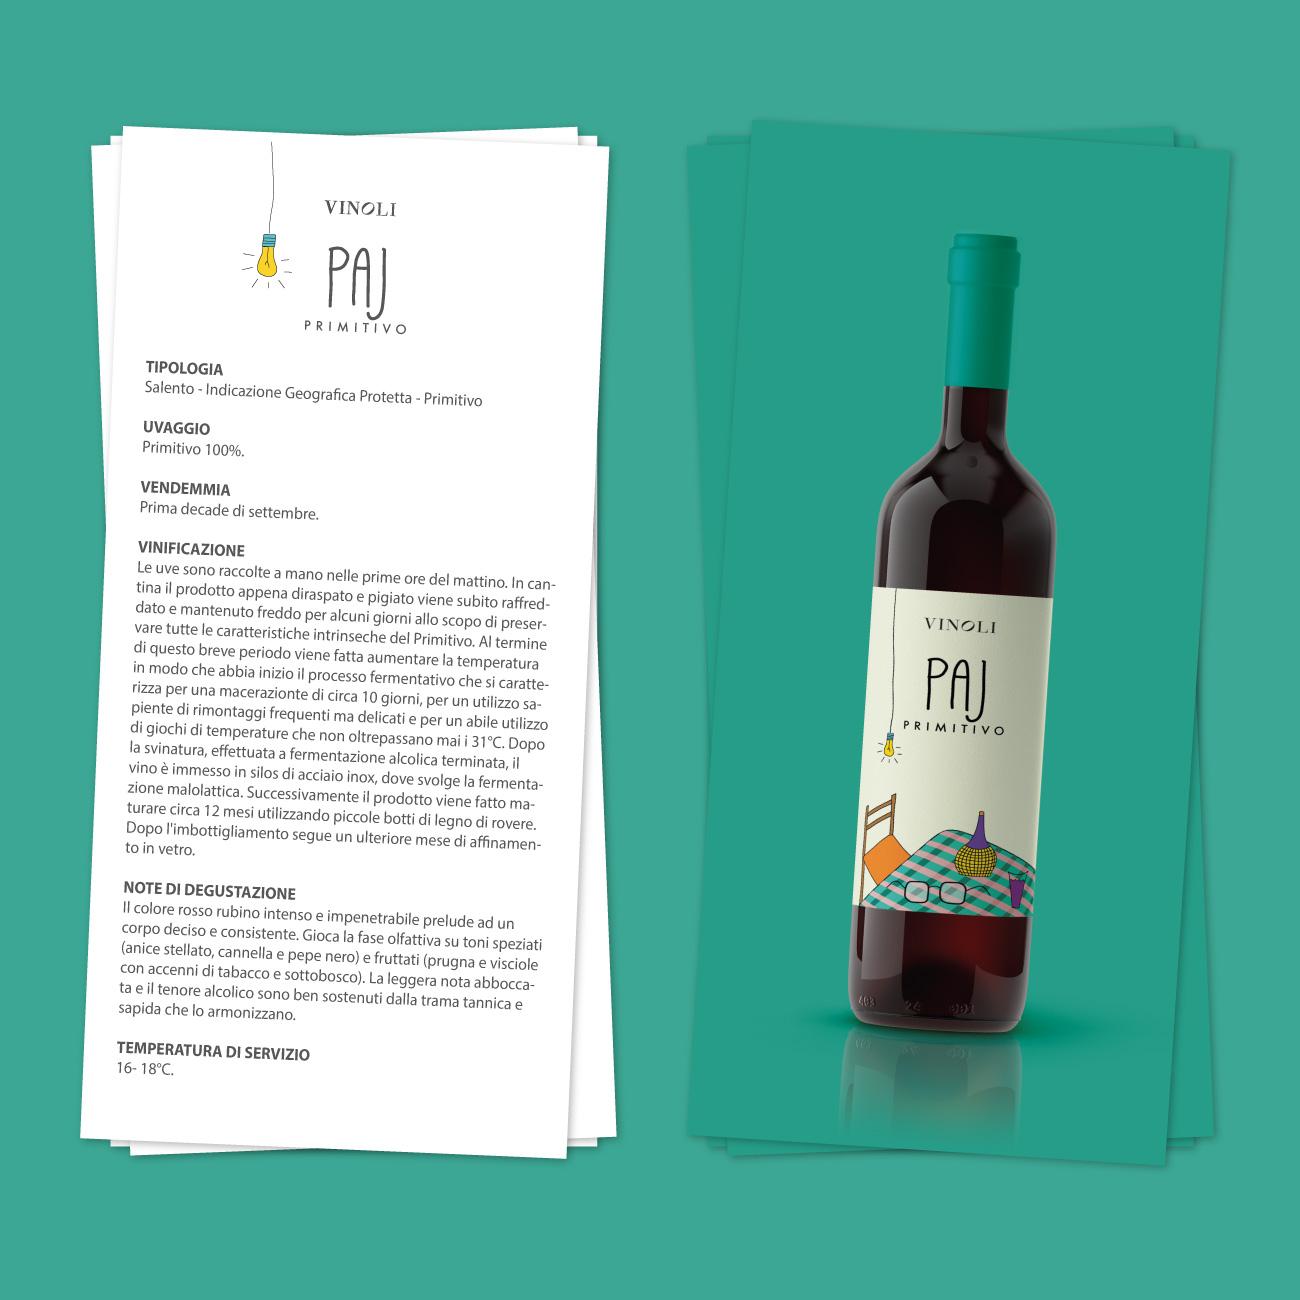 https://www.orlandinifrancesco.com/wp/wp-content/uploads/2019/07/Vinoli-Scheda-Tecnica-Paj-Orlandini-Francesco-1.jpg